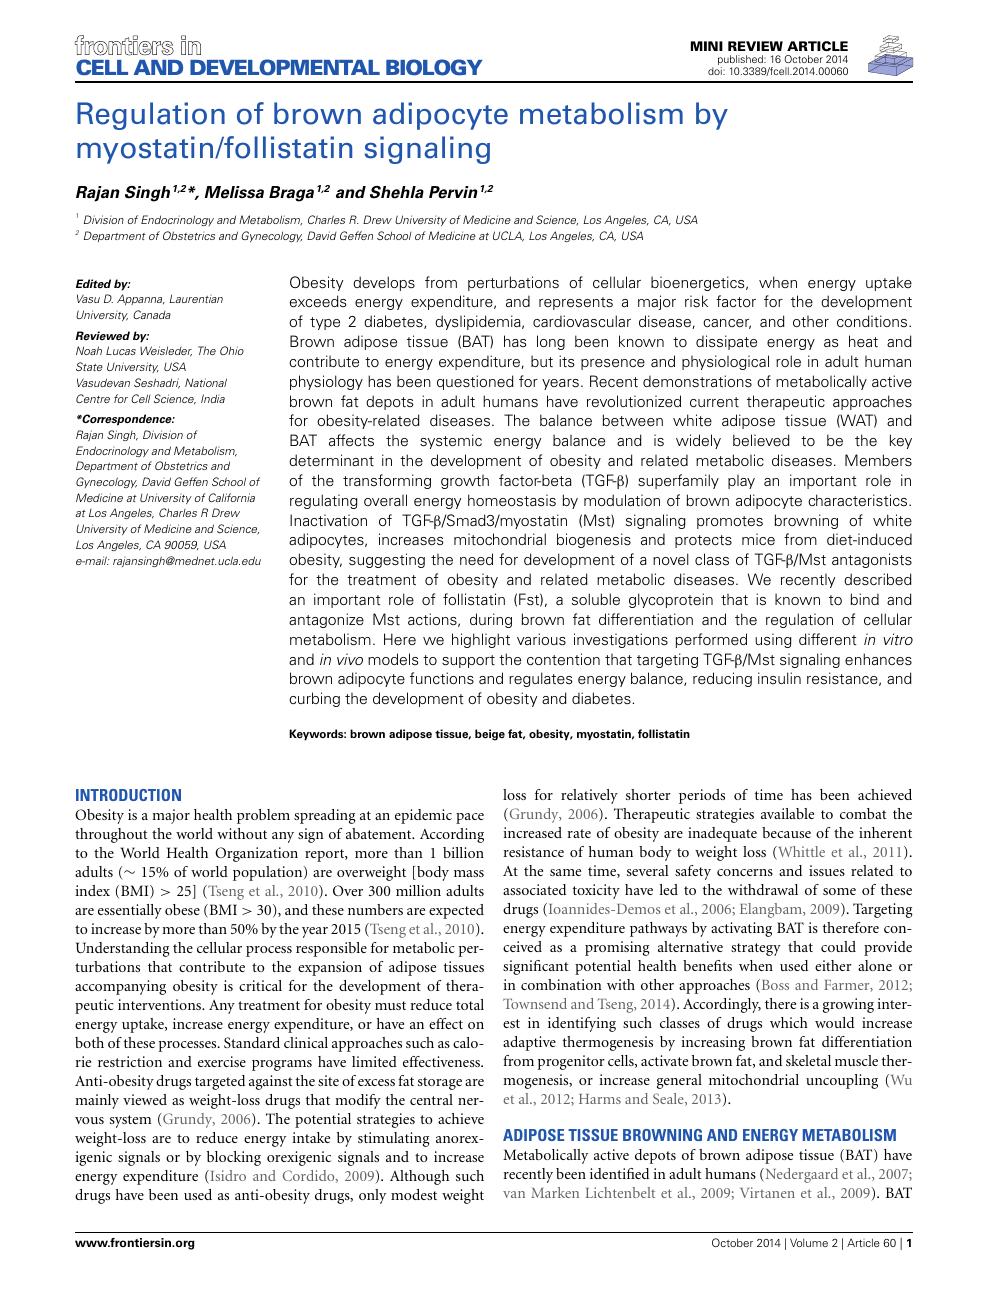 Regulation of brown adipocyte metabolism by myostatin